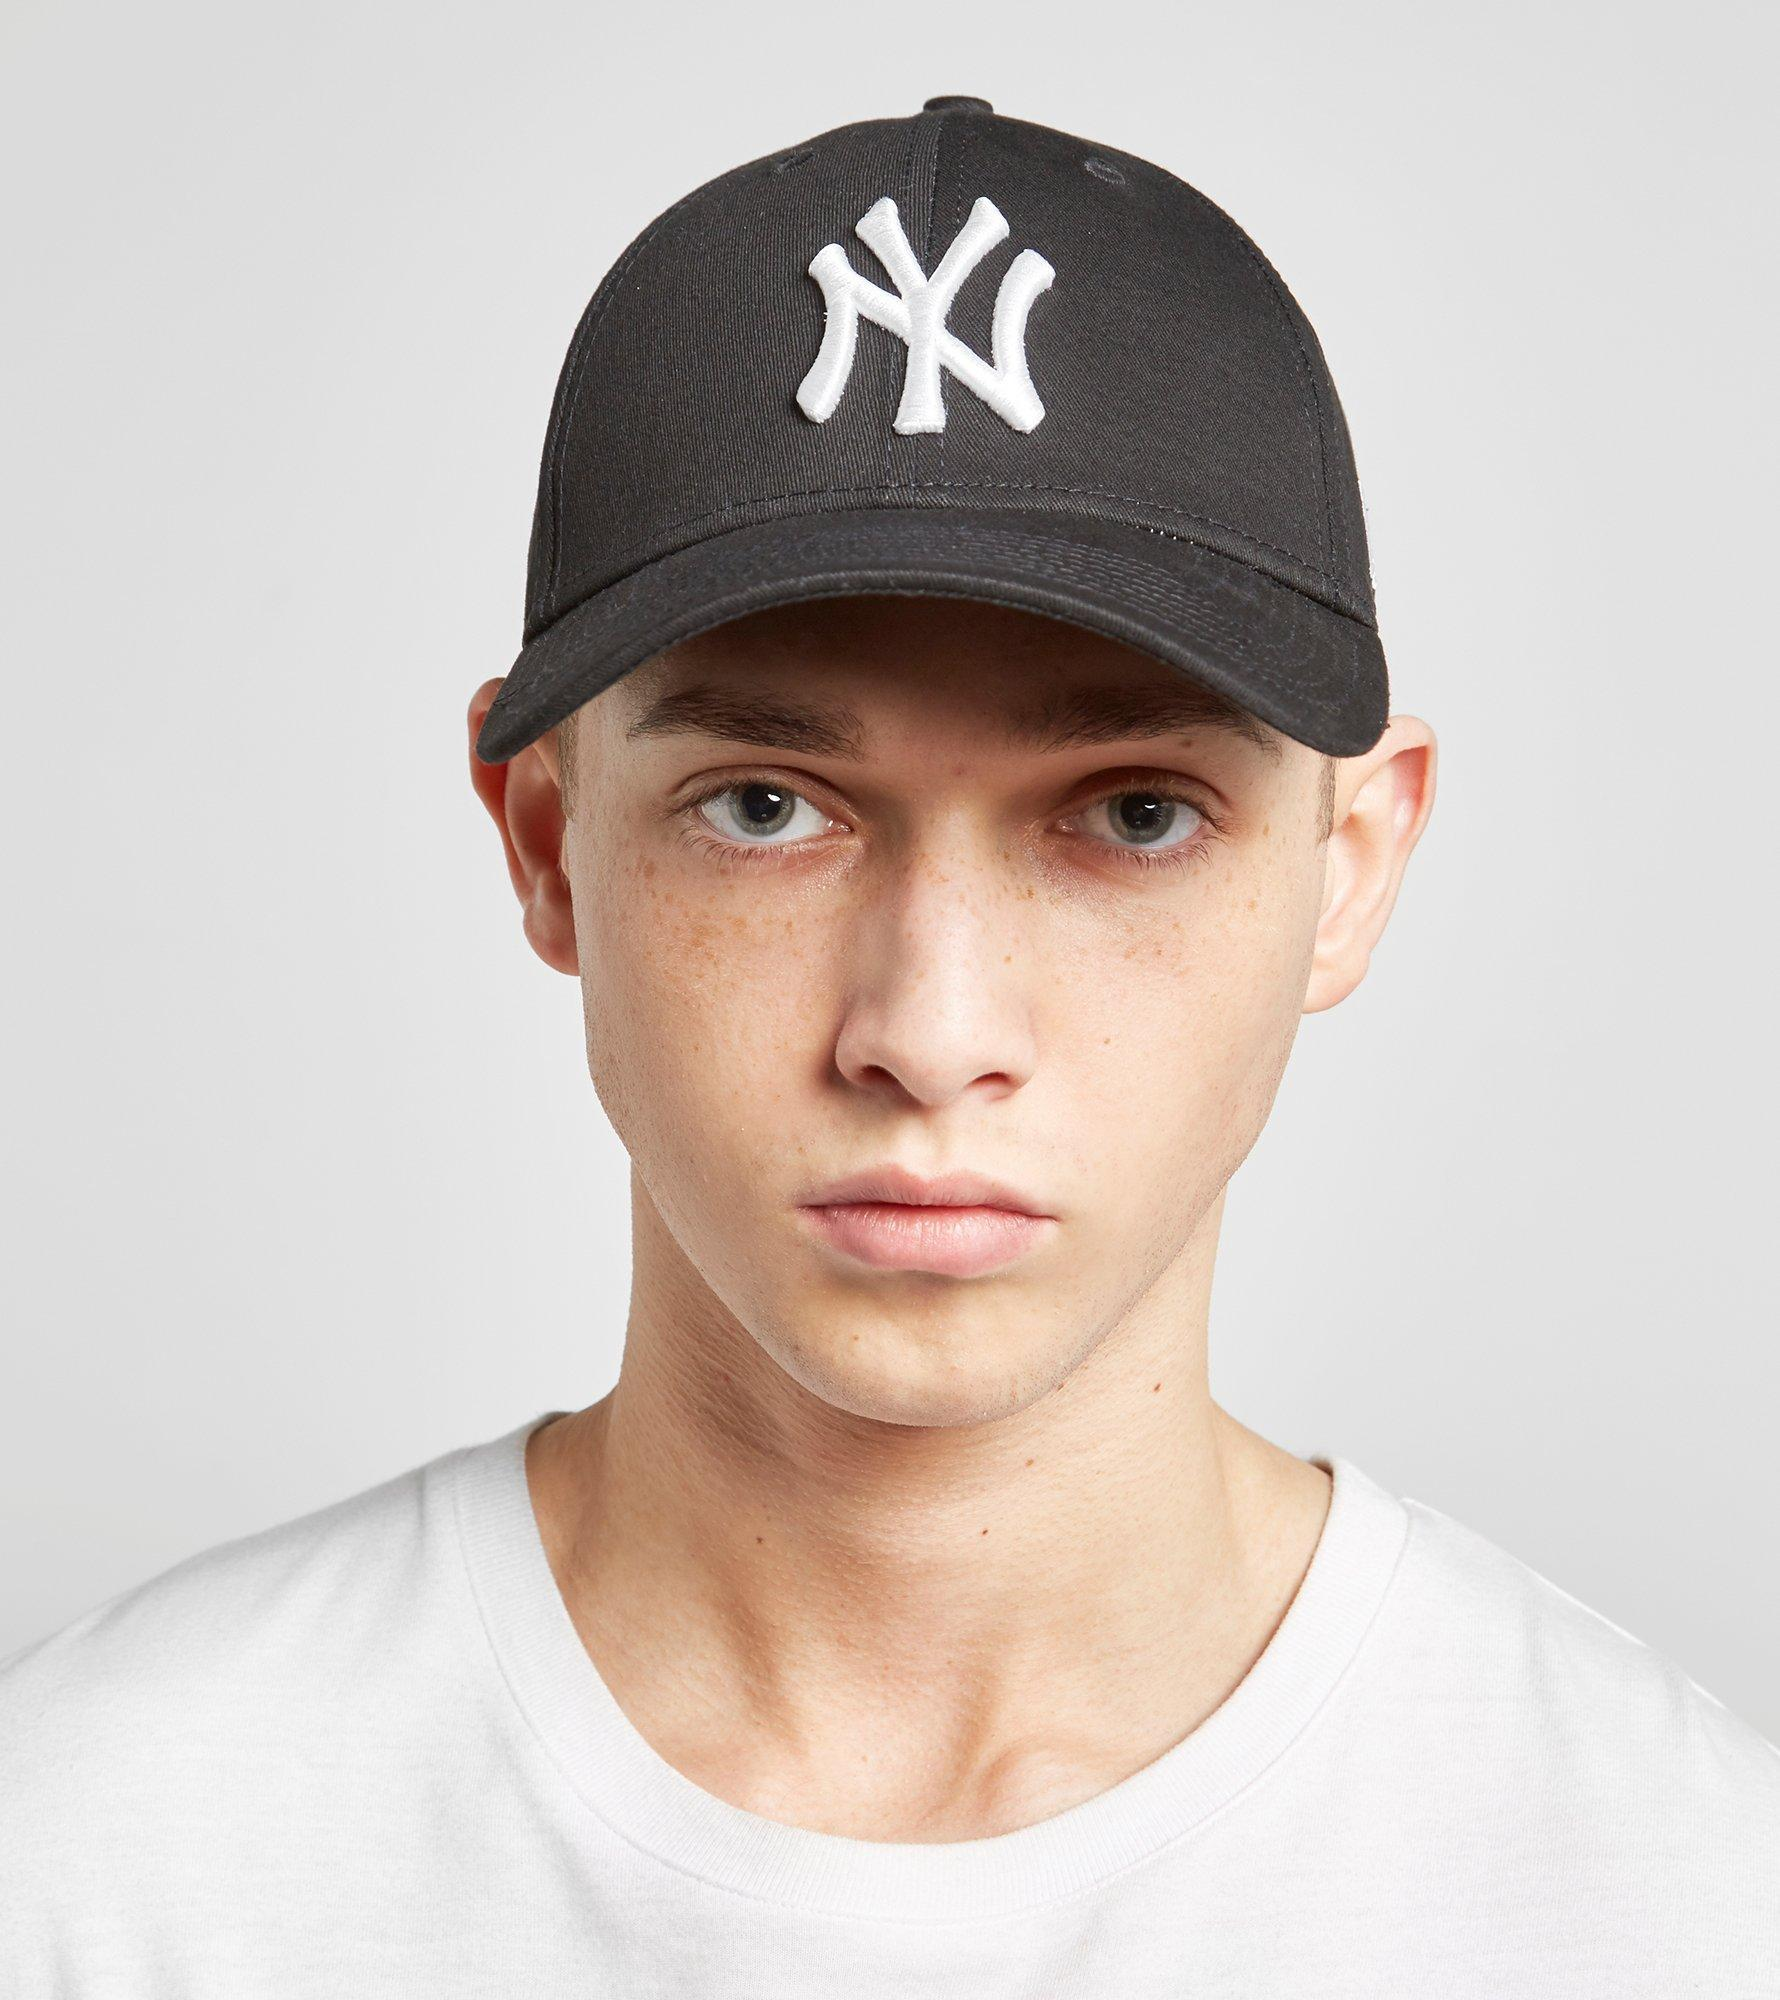 ... get lyst ktz mlb new york yankees 9forty cap in black for men 0fa93  be2ca 78483224530f